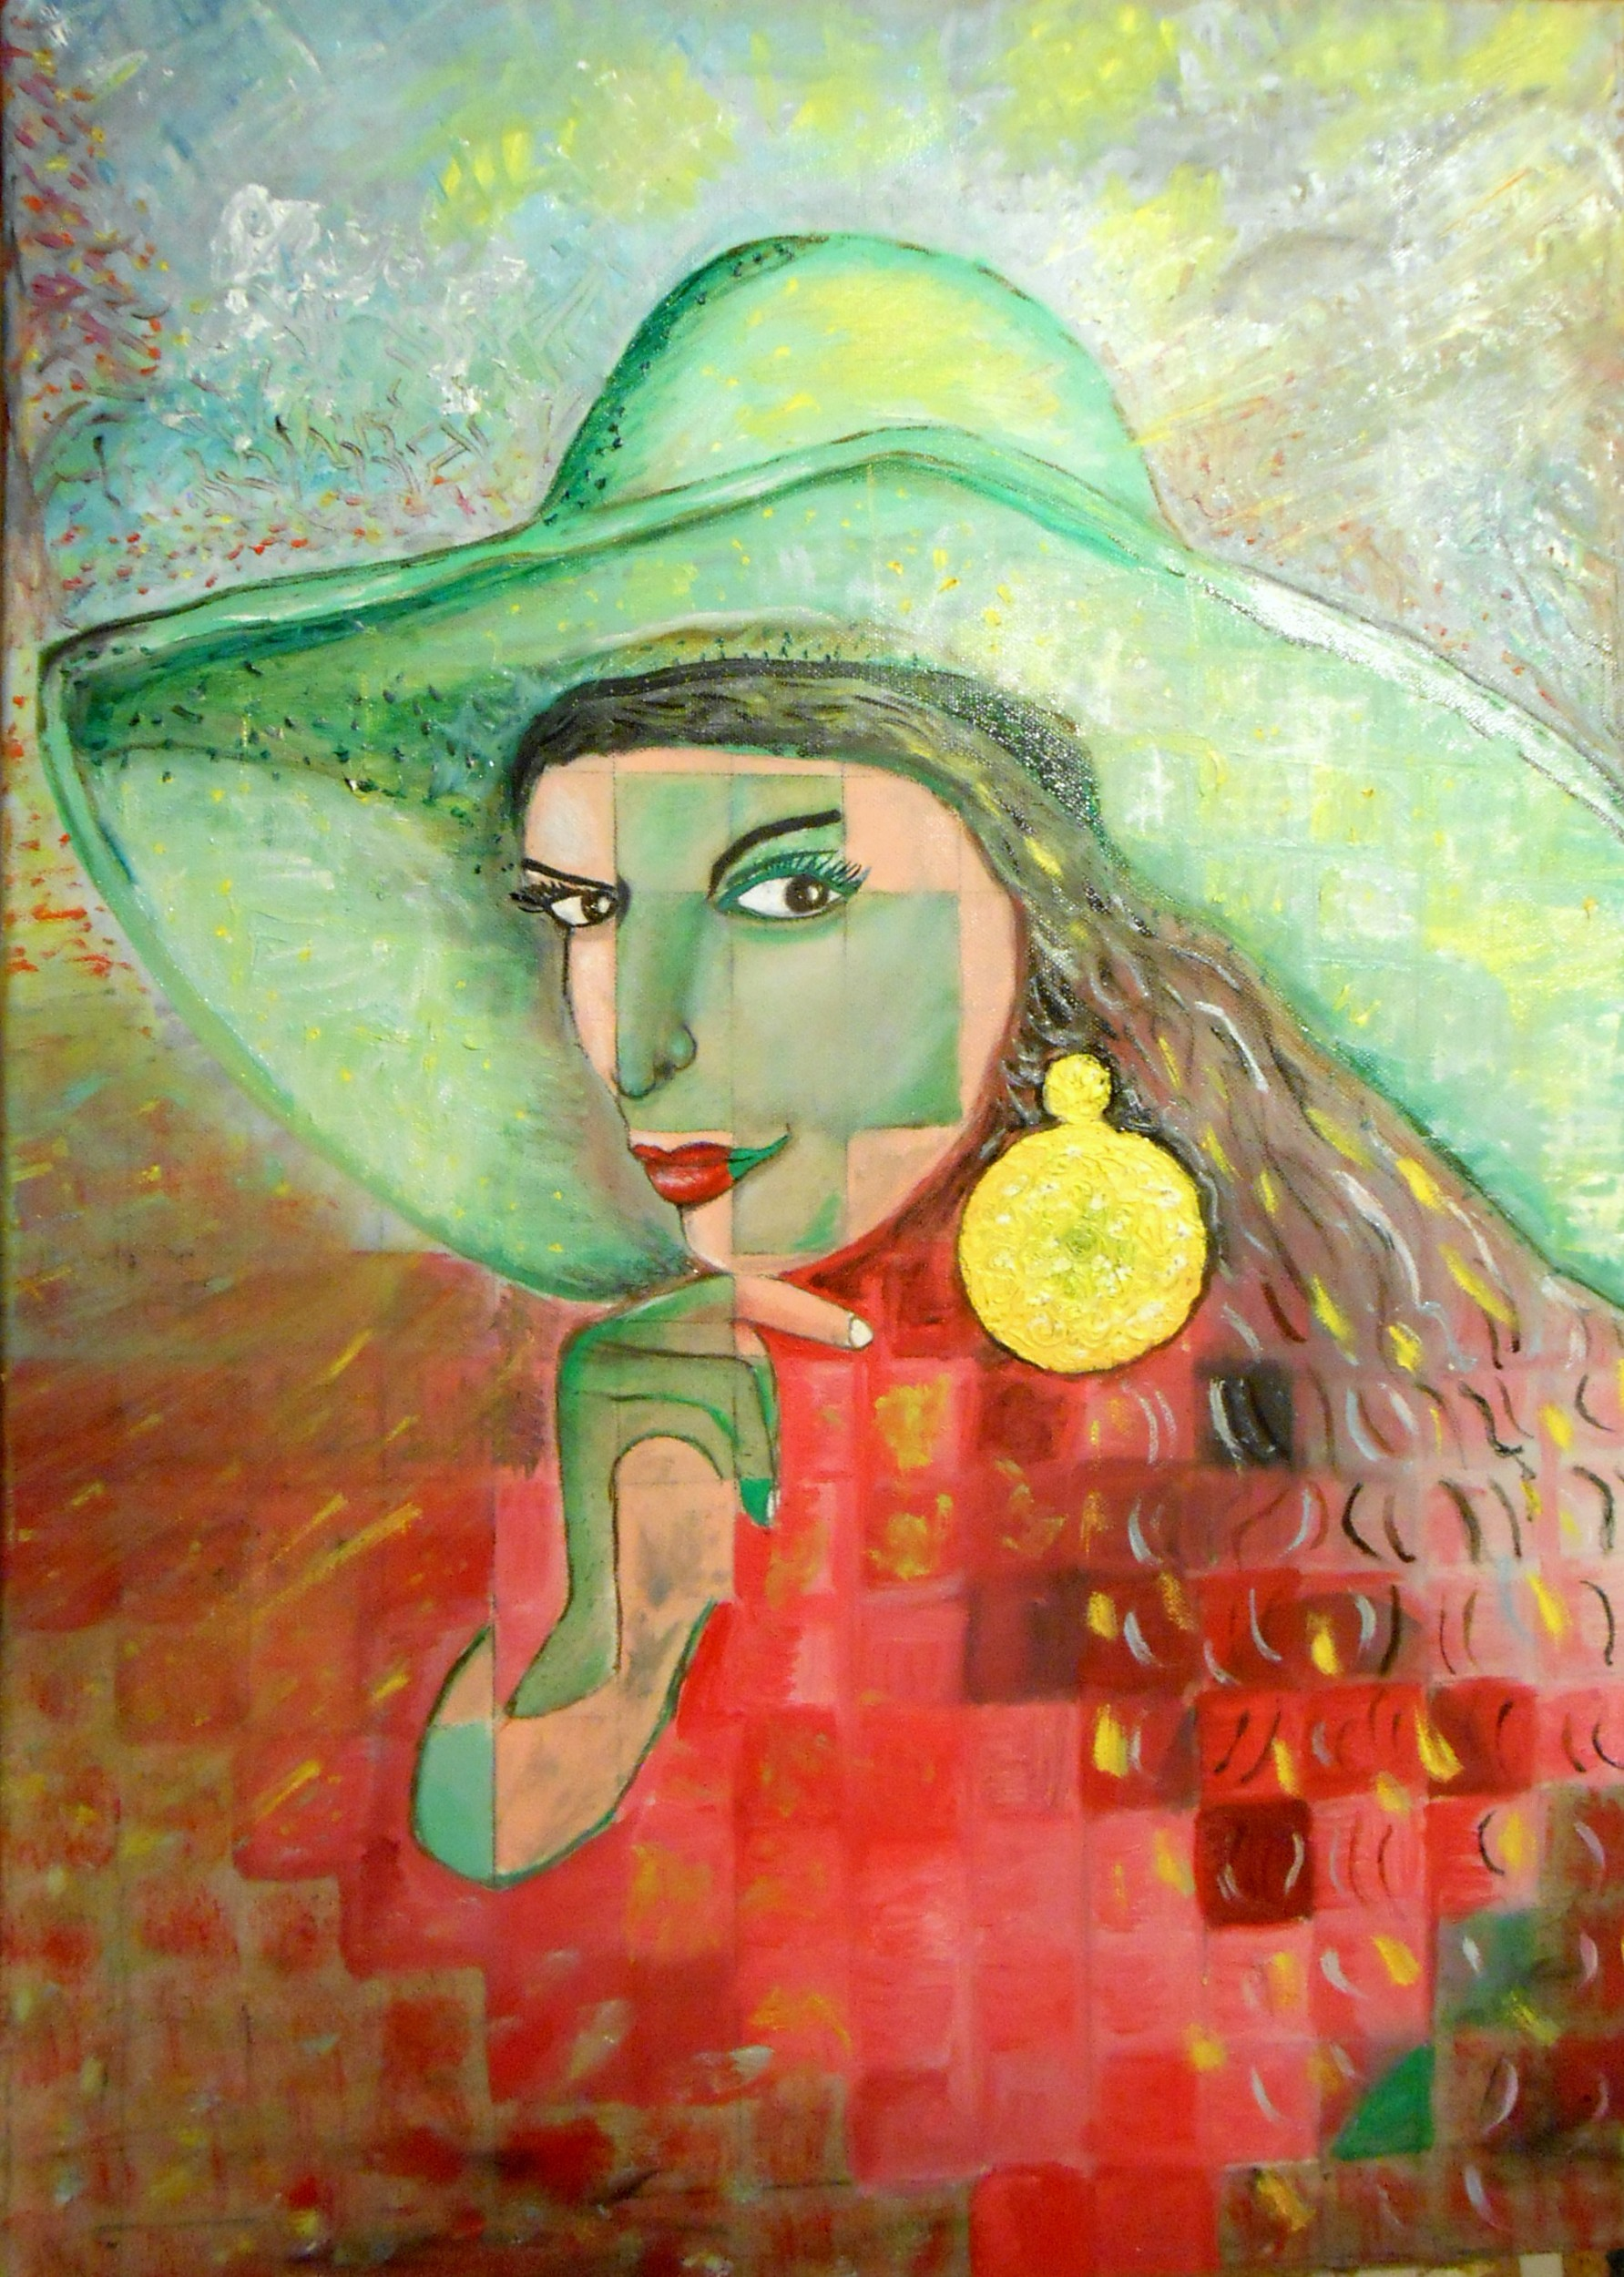 donna con cappello - anetamalinowskaART - Opera Celeste Network